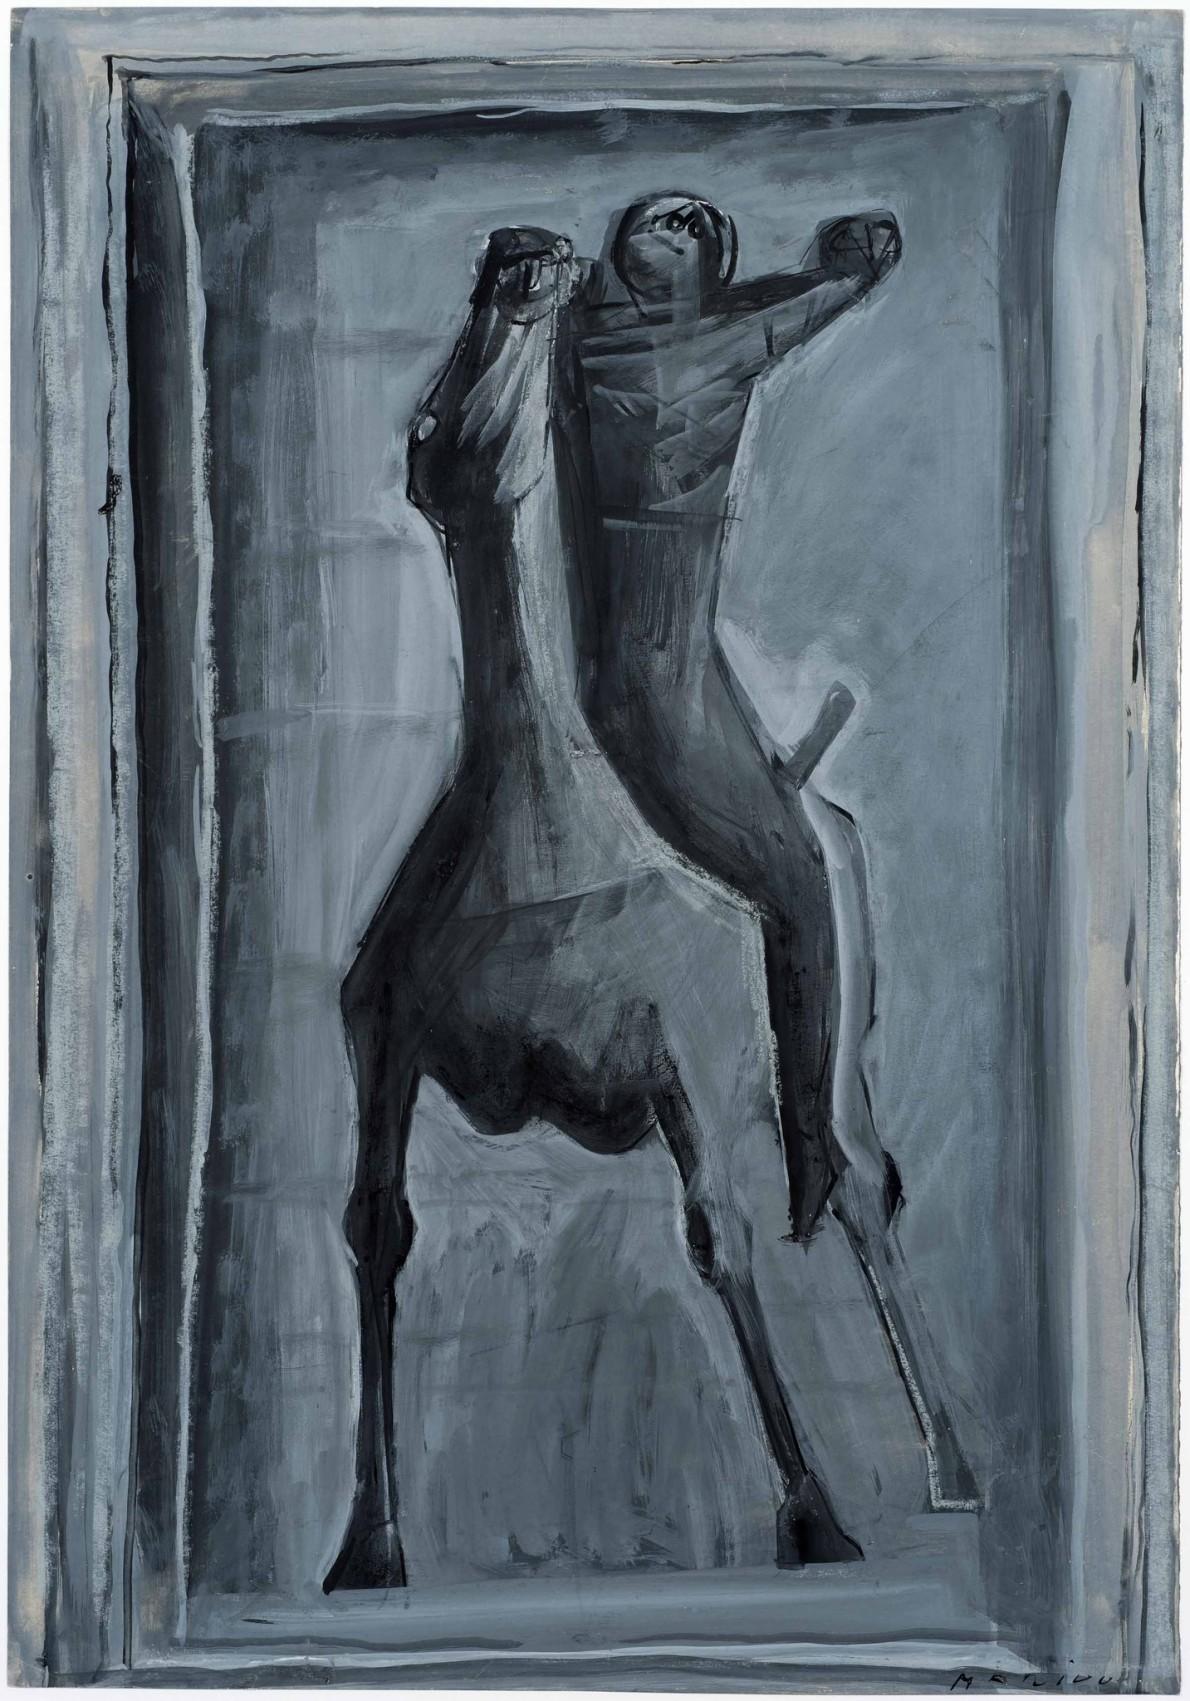 Marino Marini, Cavaliere, 1947